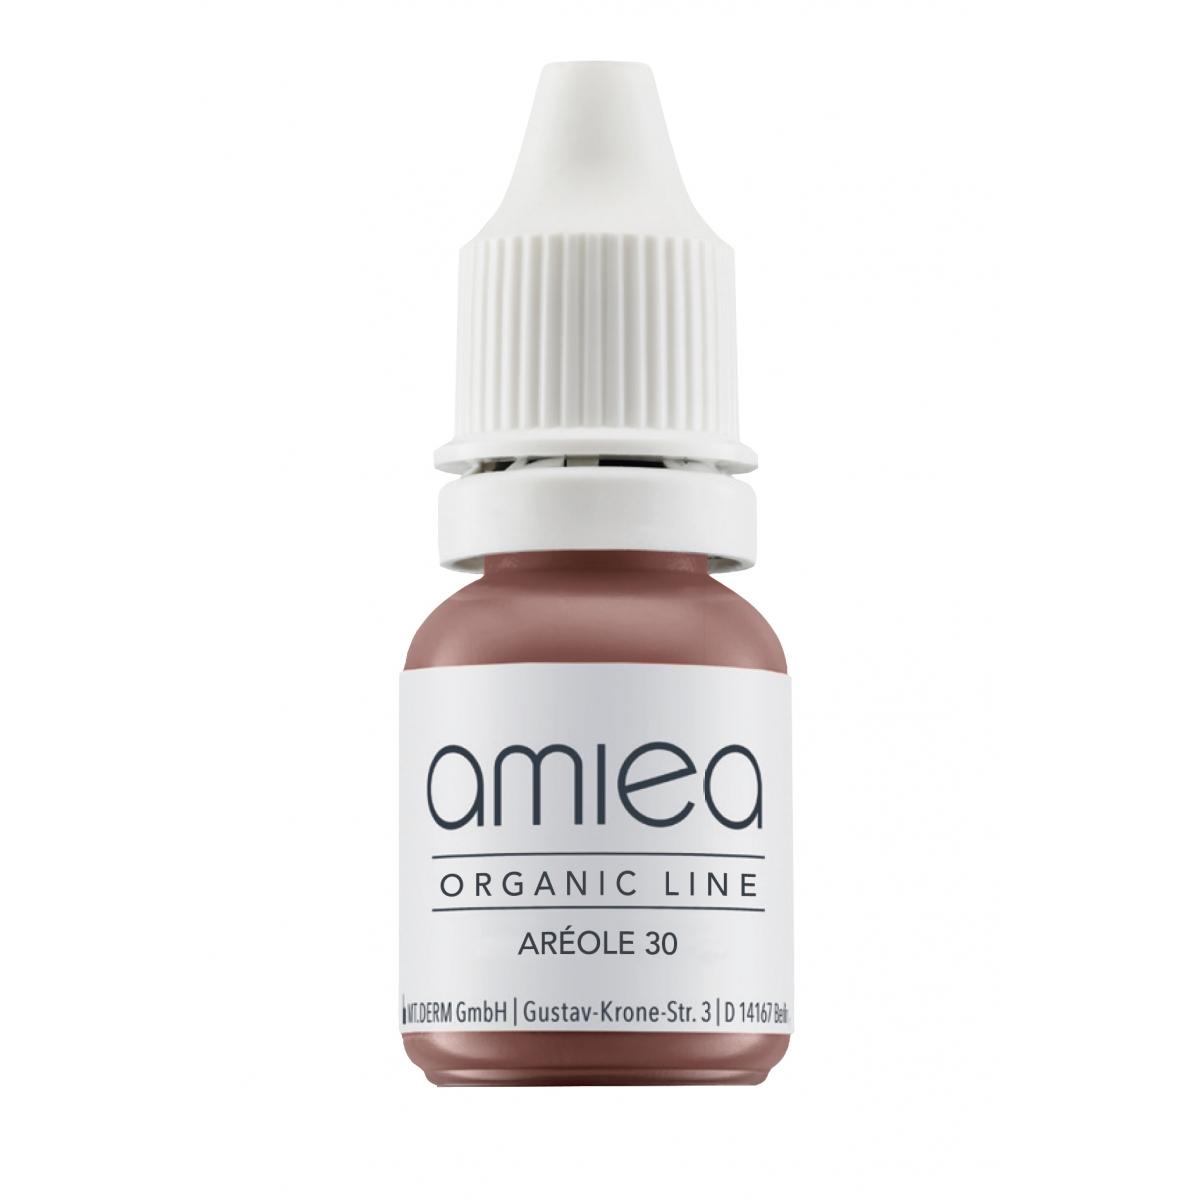 Organicline (5 ml)  - PIGMENTS AMIEA ORGANICLINE AREOLES 30, Flacon 5 ml